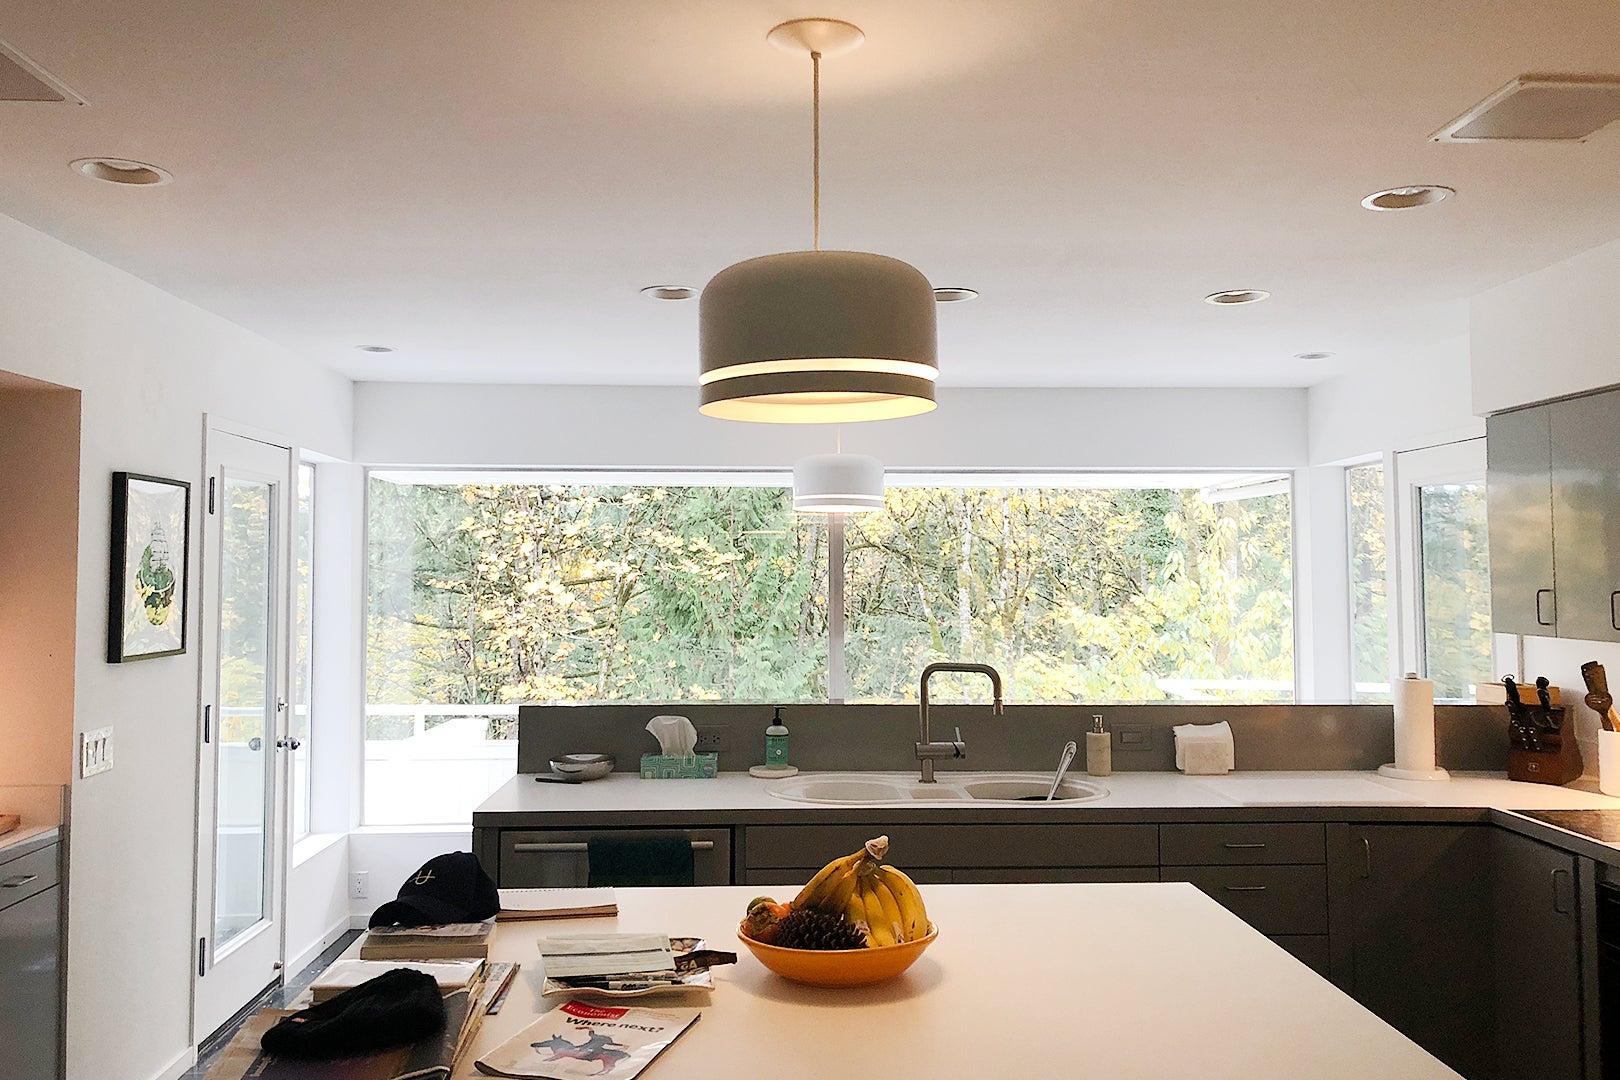 gray kitchen facing windows